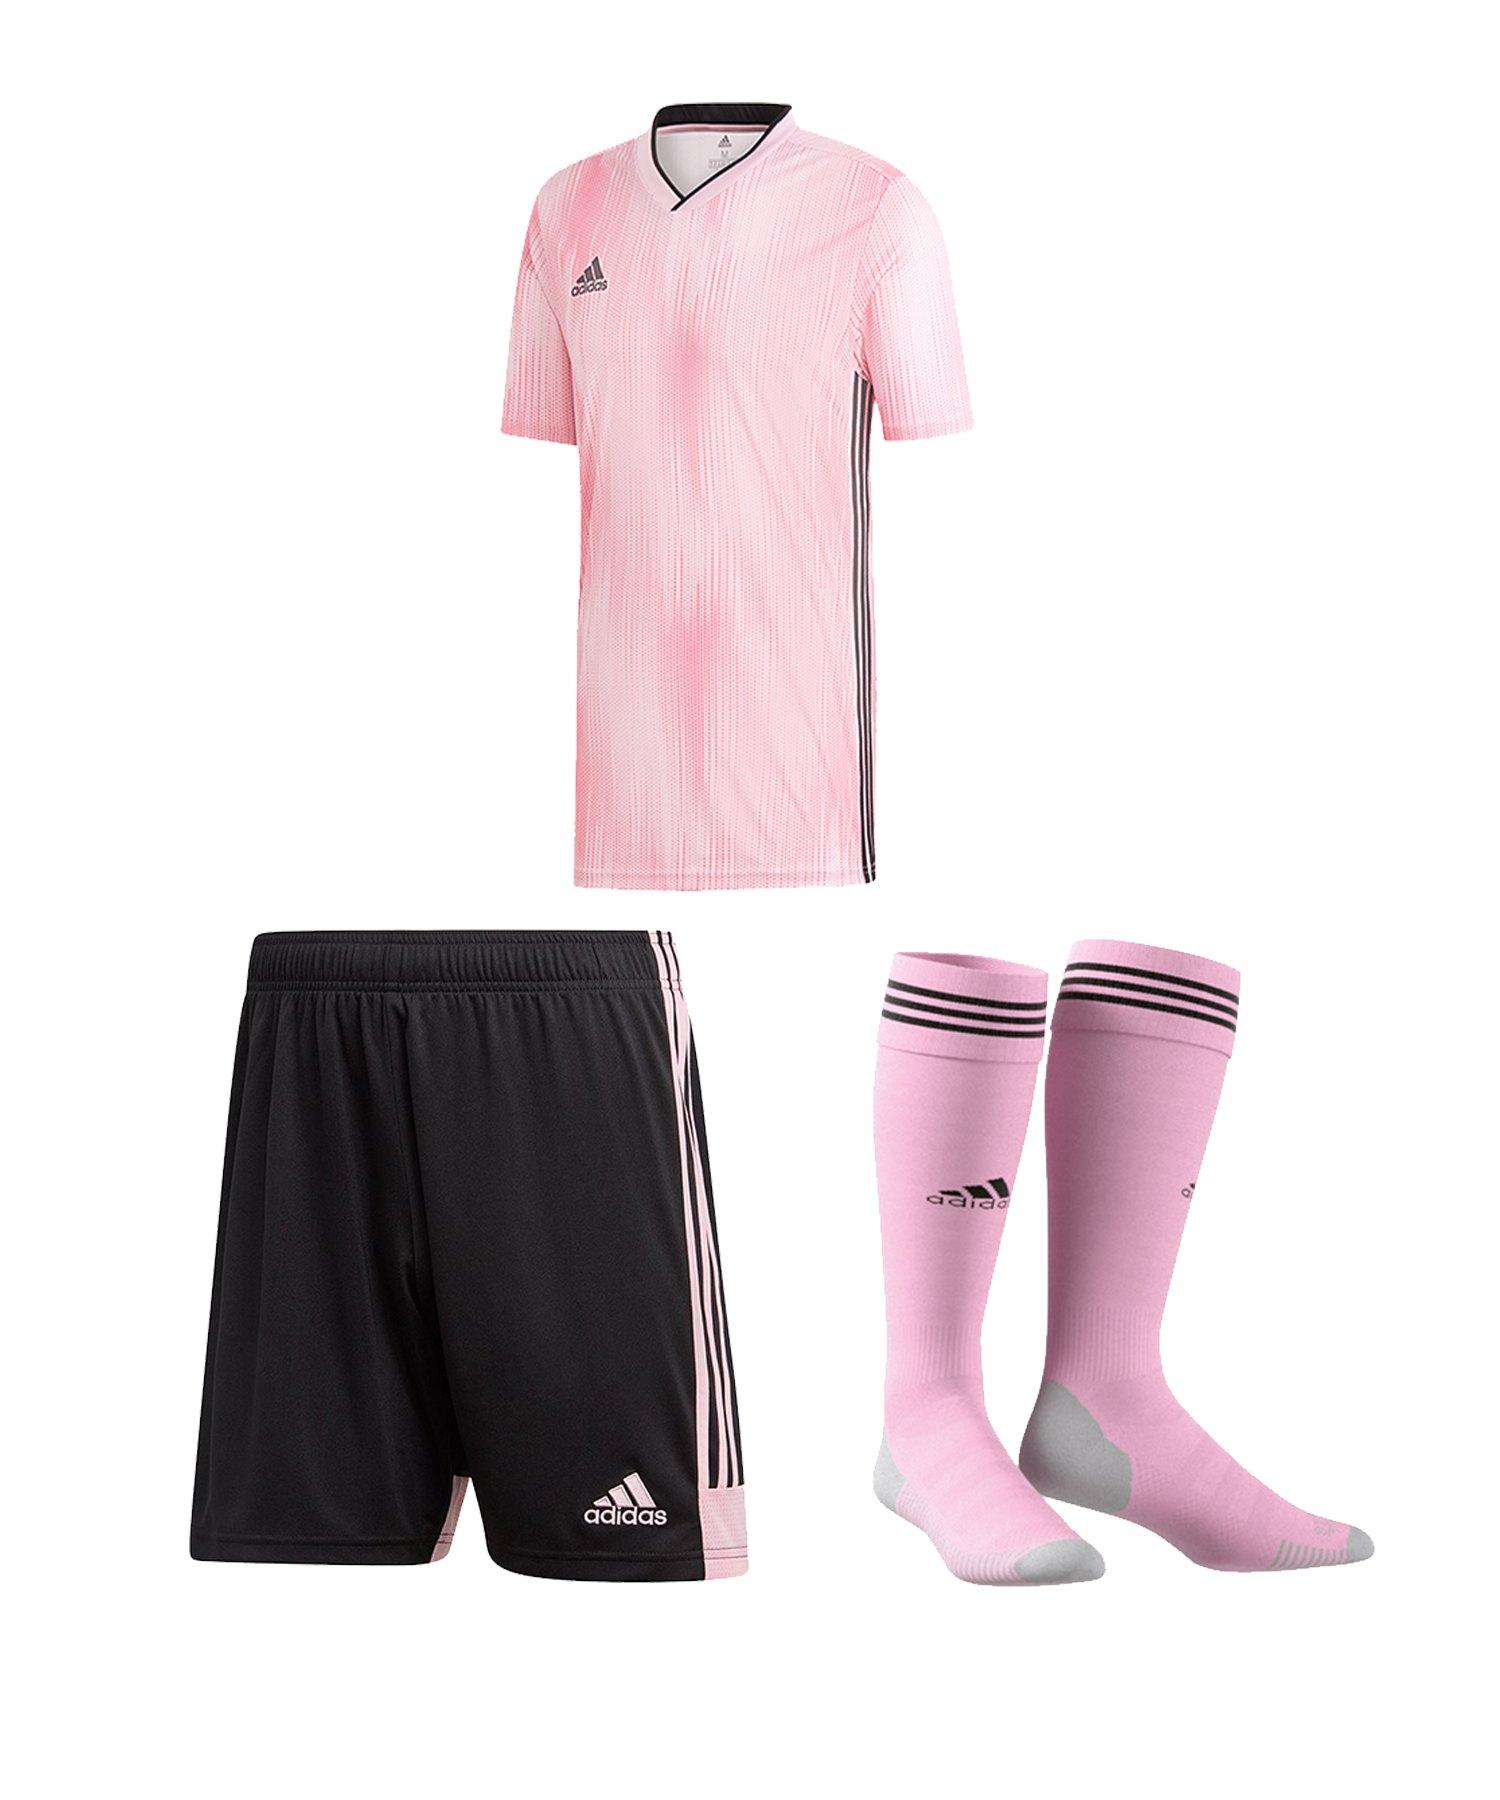 adidas Tiro 19 Trikotset kurzarm Pink Schwarz - pink